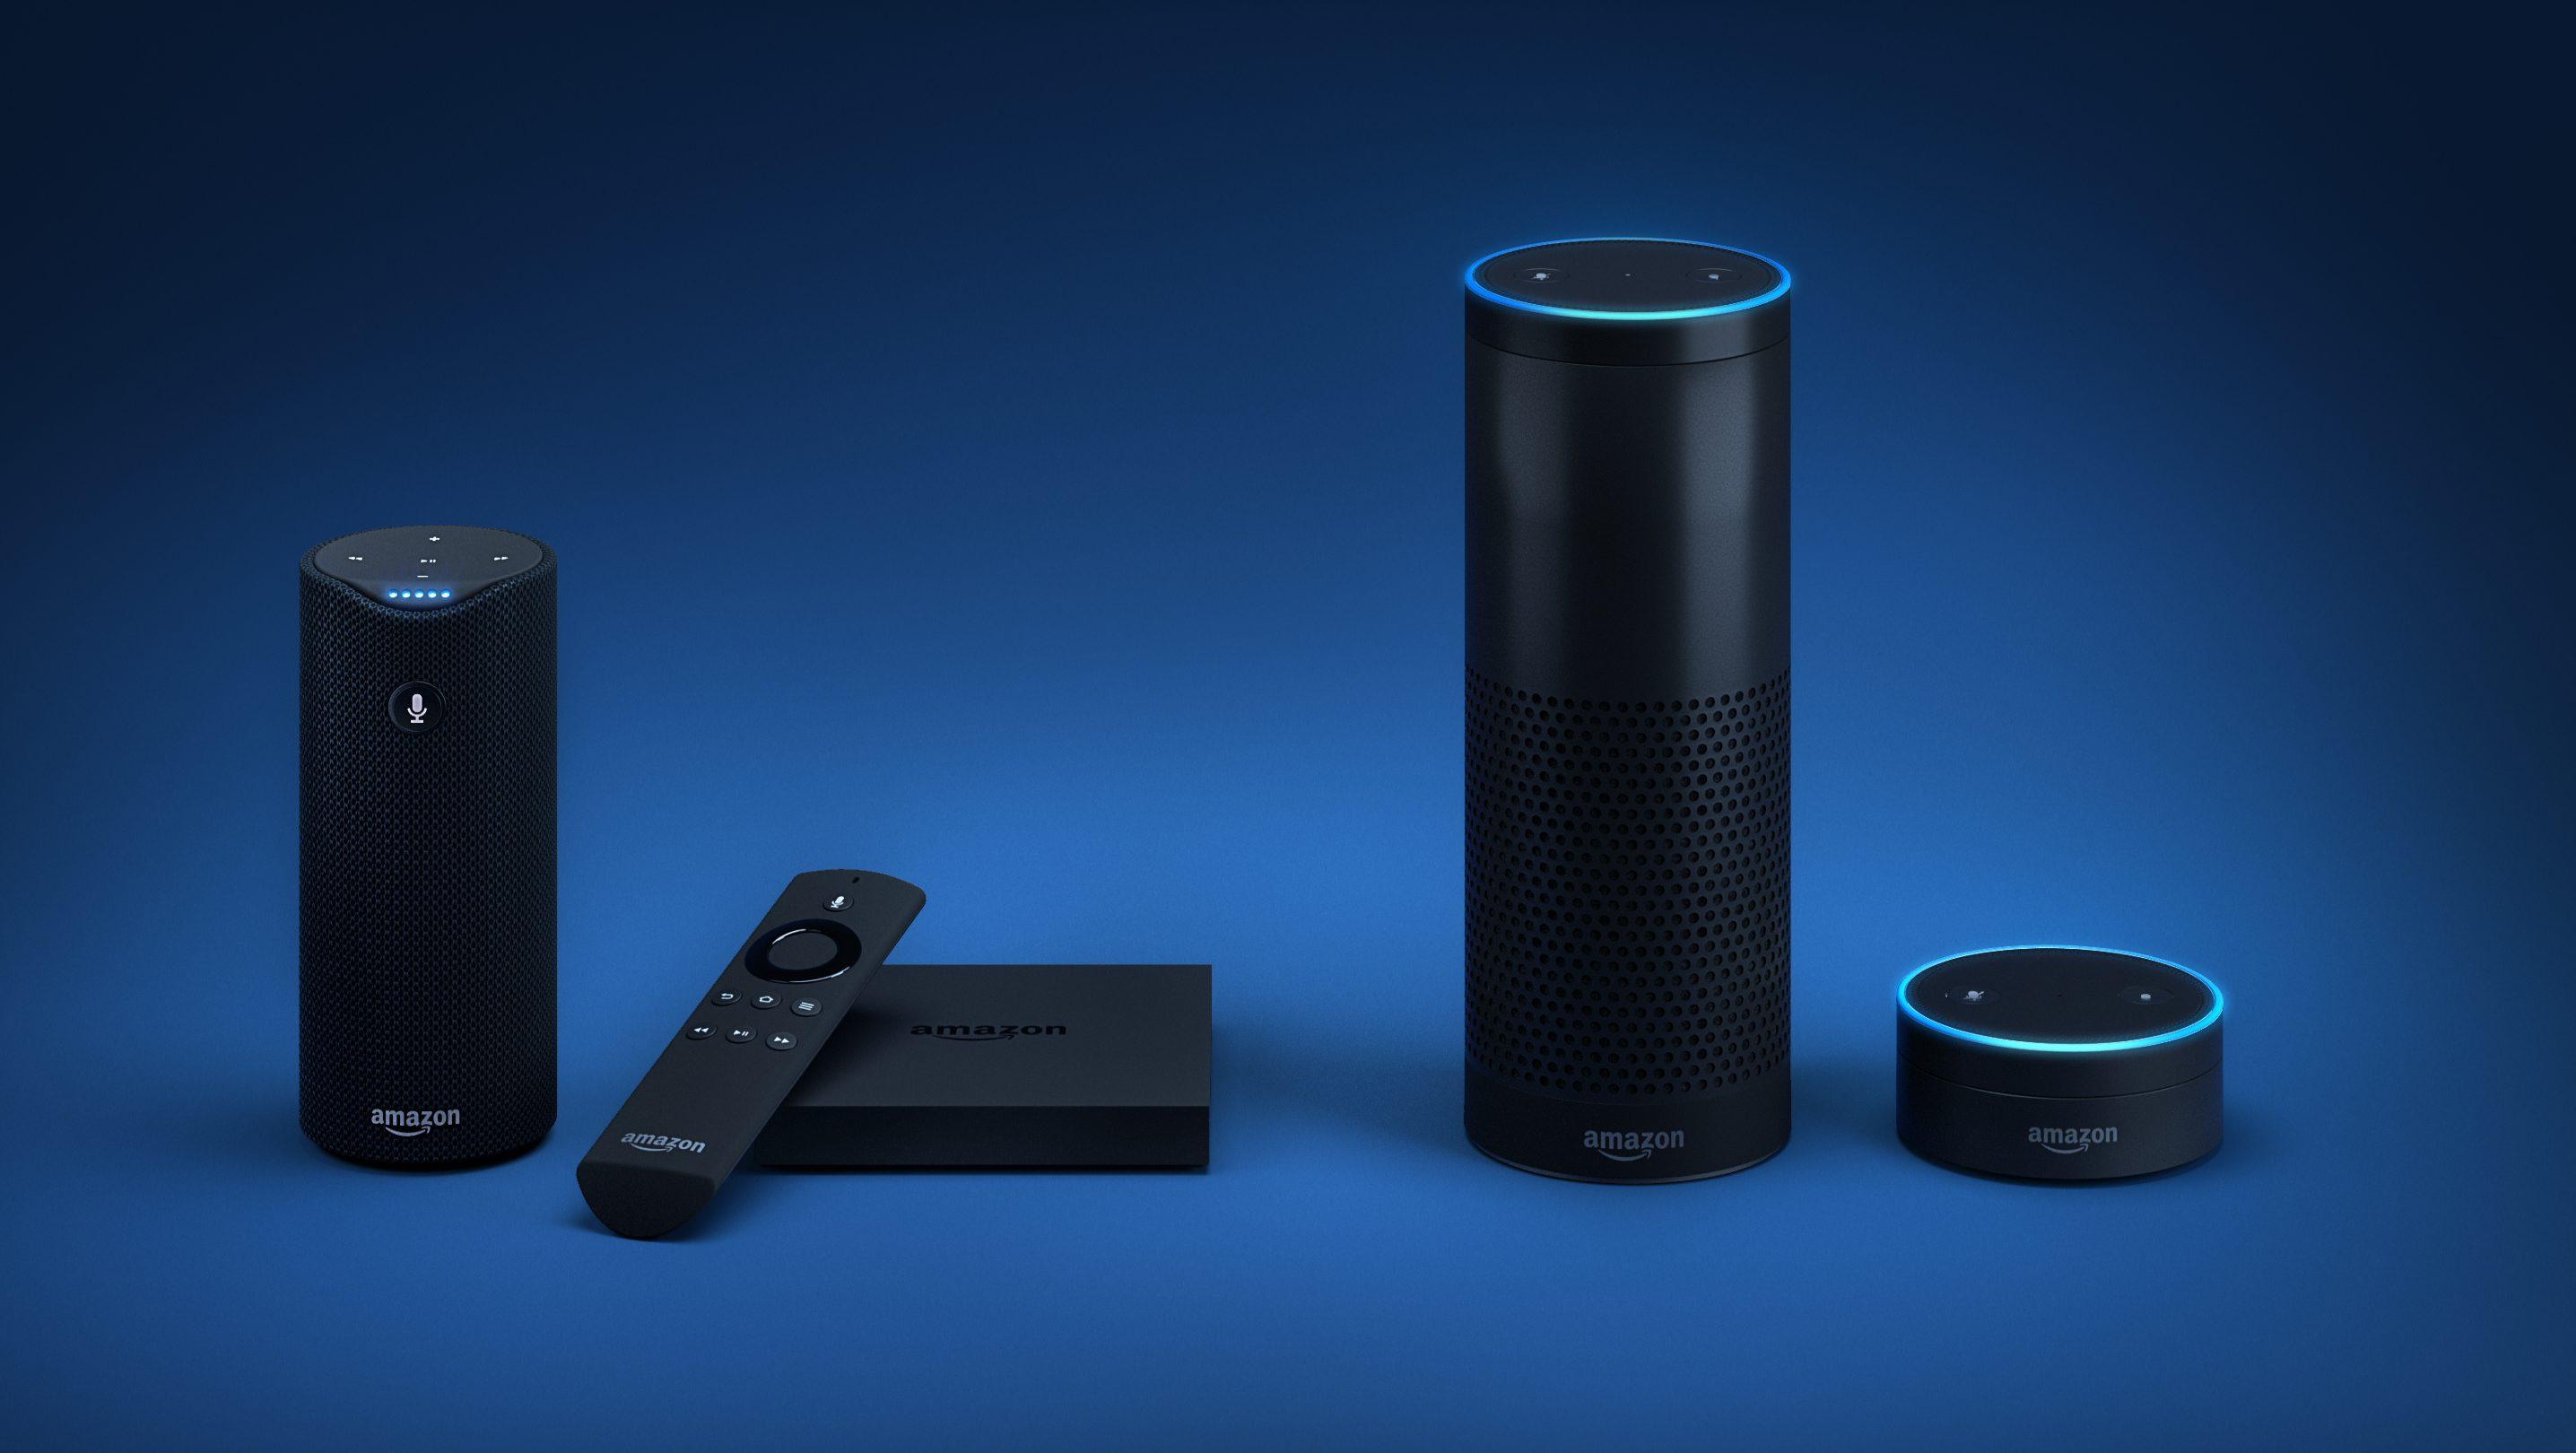 Now you can build your own Amazon (AMZN) Echo or Google Home (GOOG